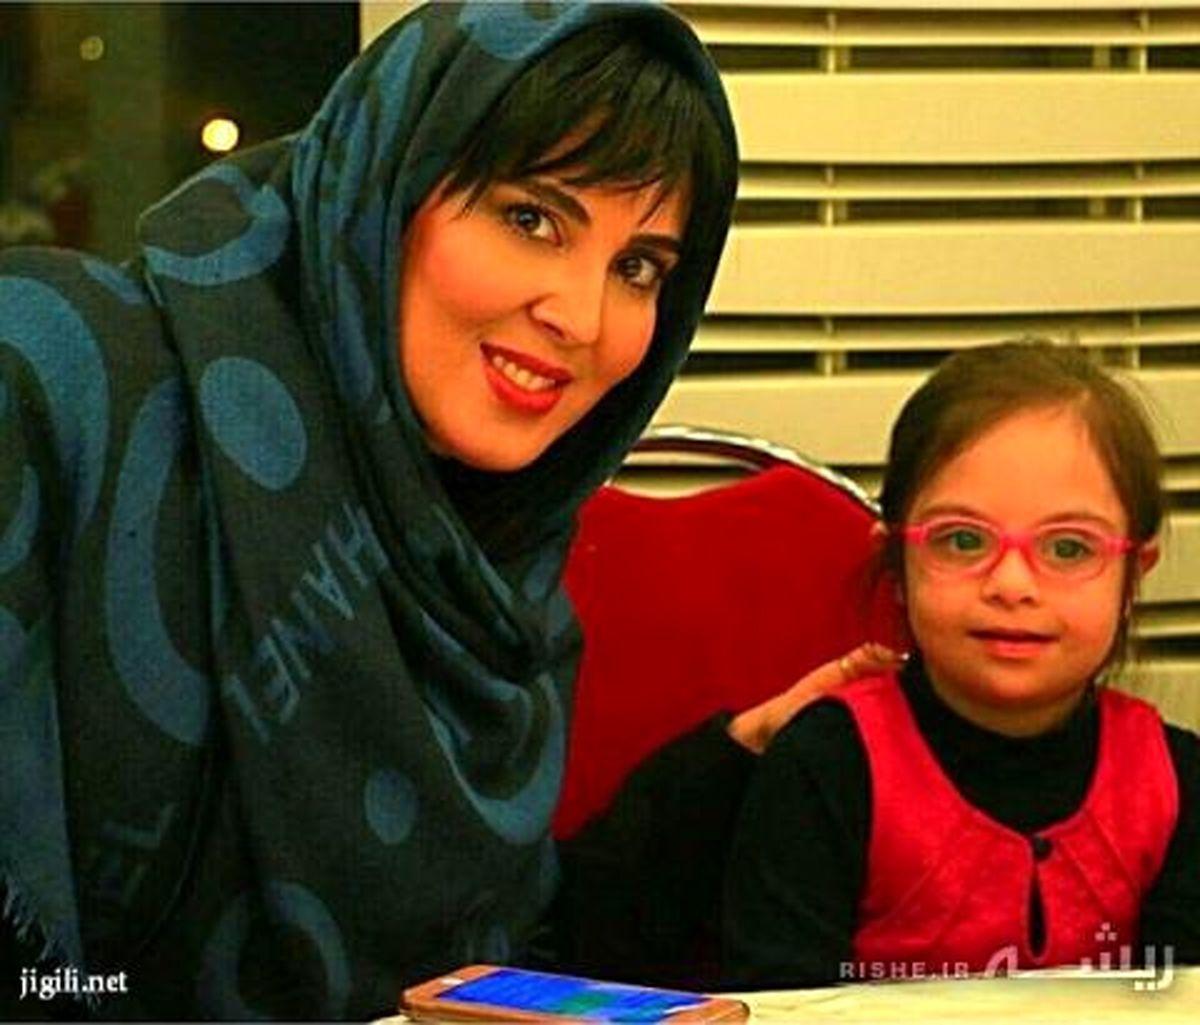 «لیلا بلوکات»  ۸ بچه دارد! +تصاویر